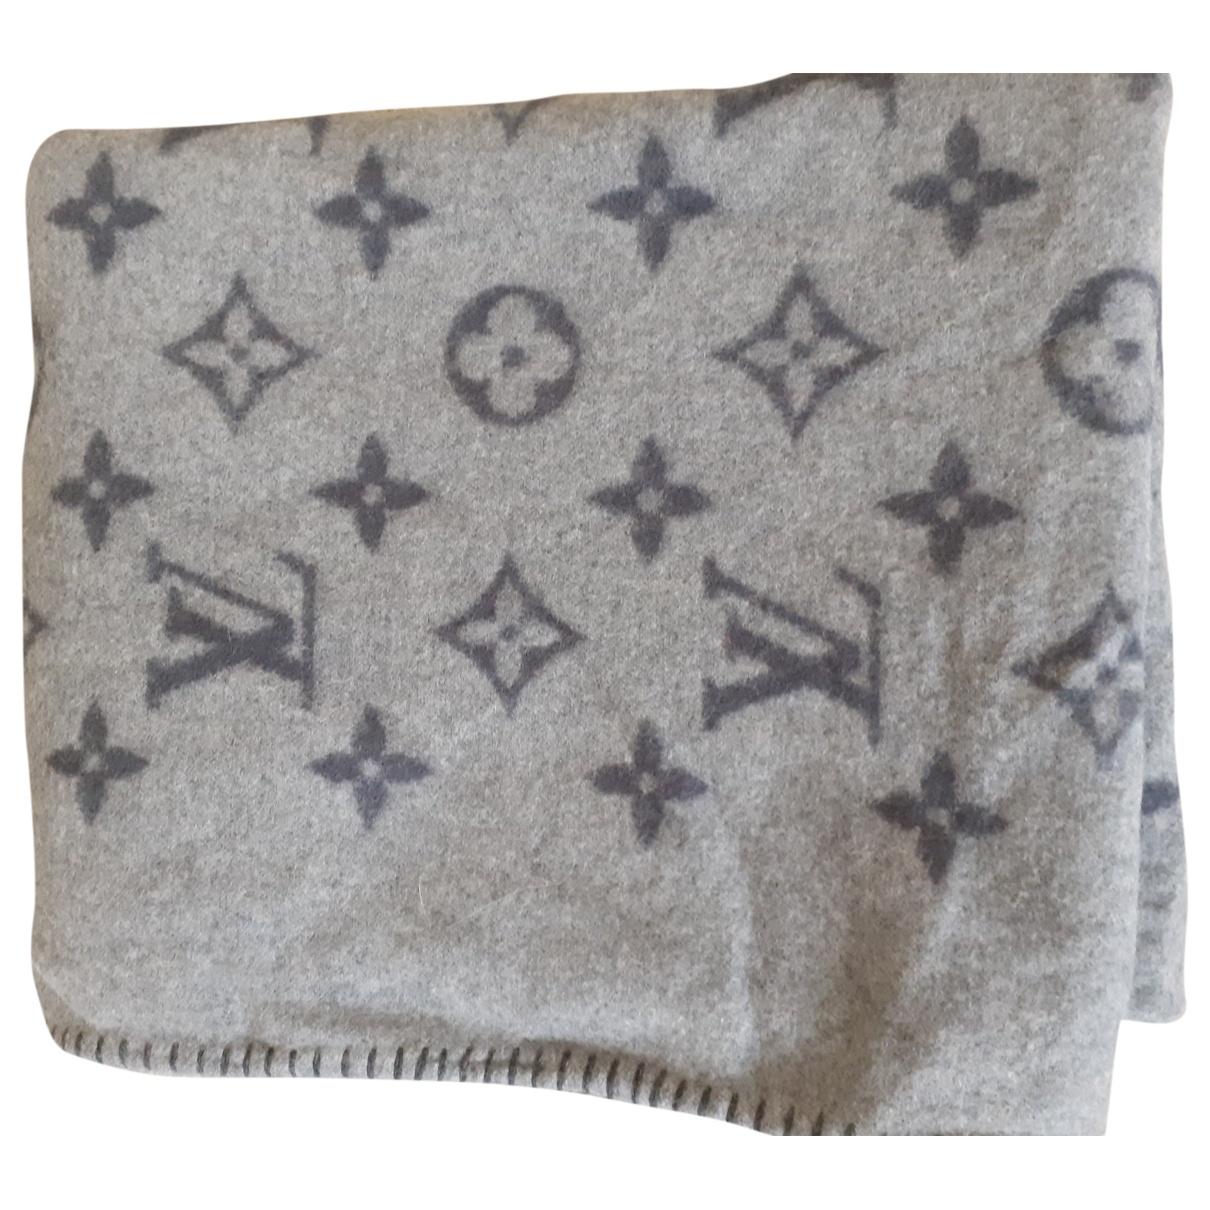 Louis Vuitton \N Grey Wool scarf for Women \N